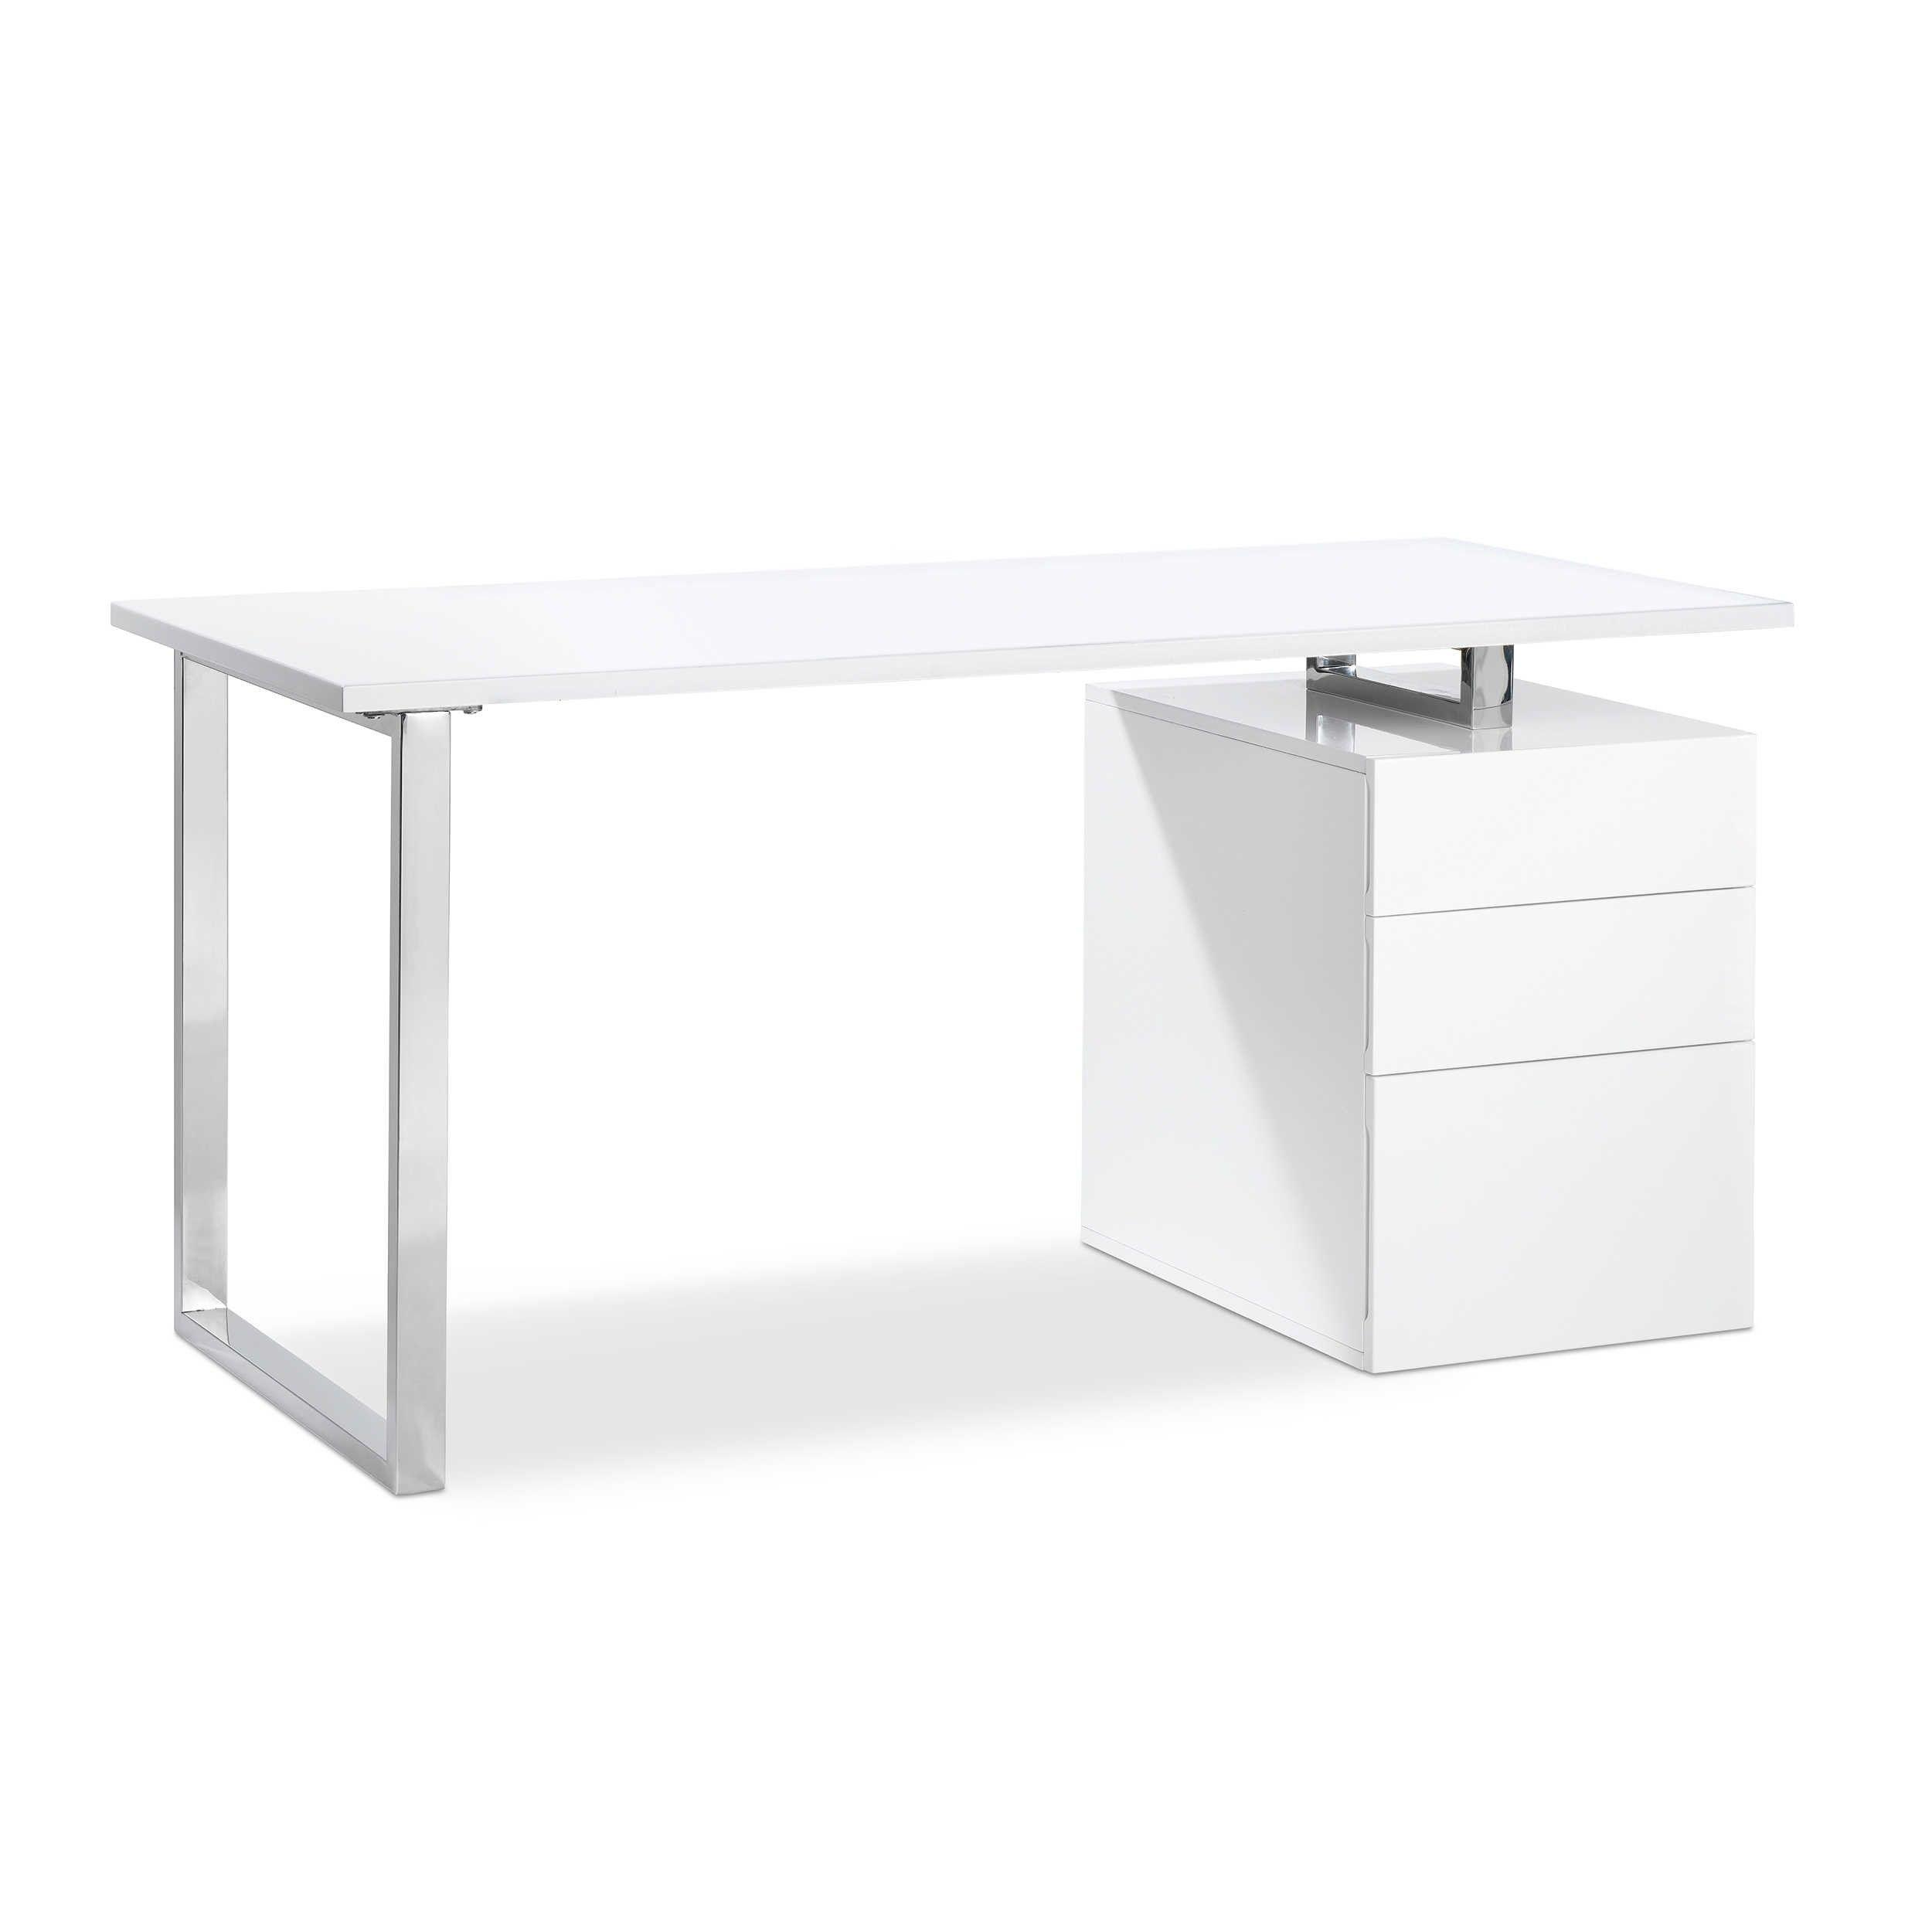 Schreibtisch Weiss Guenstig 2021